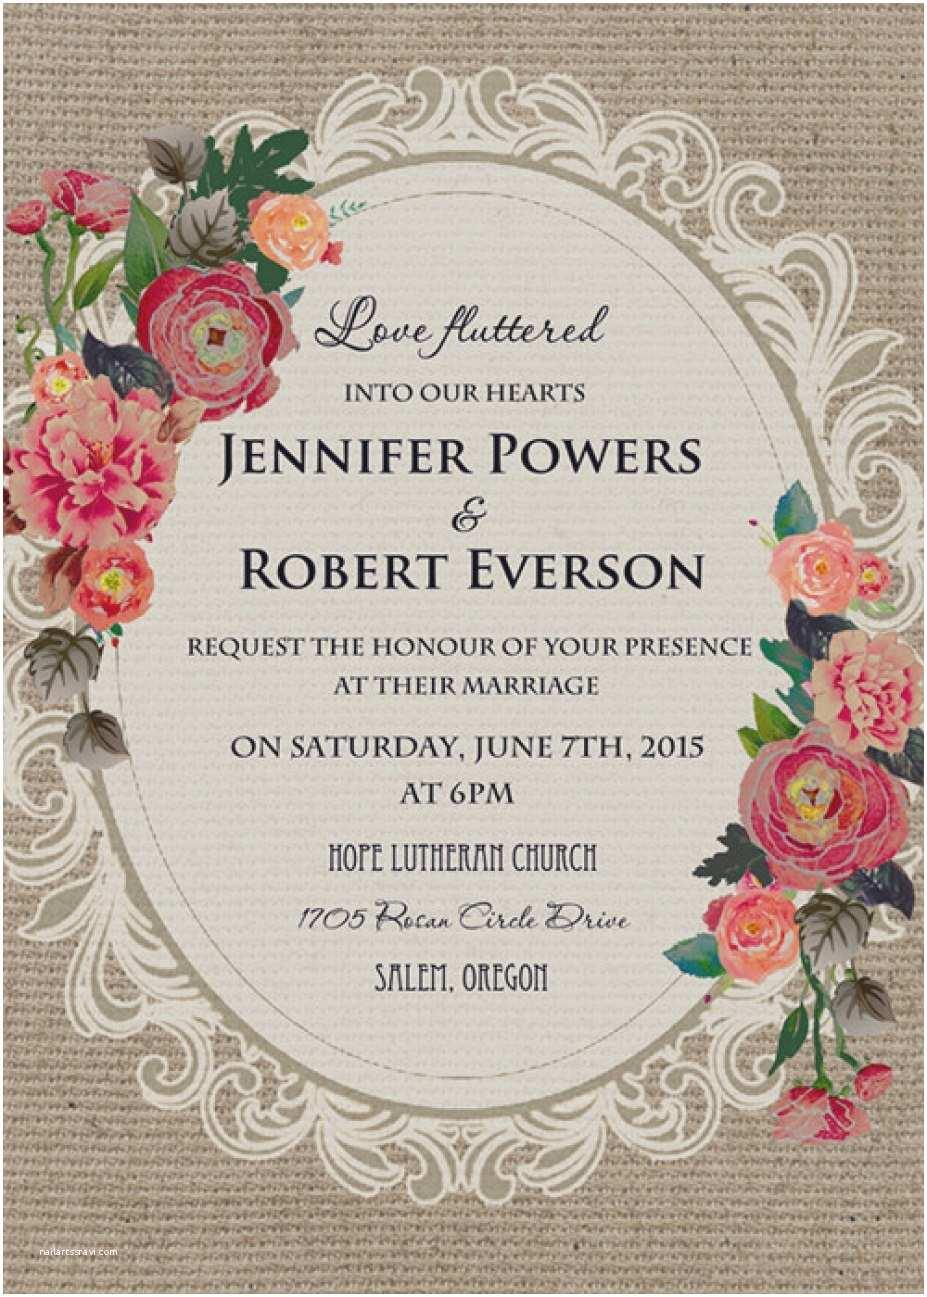 Vintage Wedding Invitations Cheap 29 Gallery Vintage Wedding Invitations Cheap the Latest